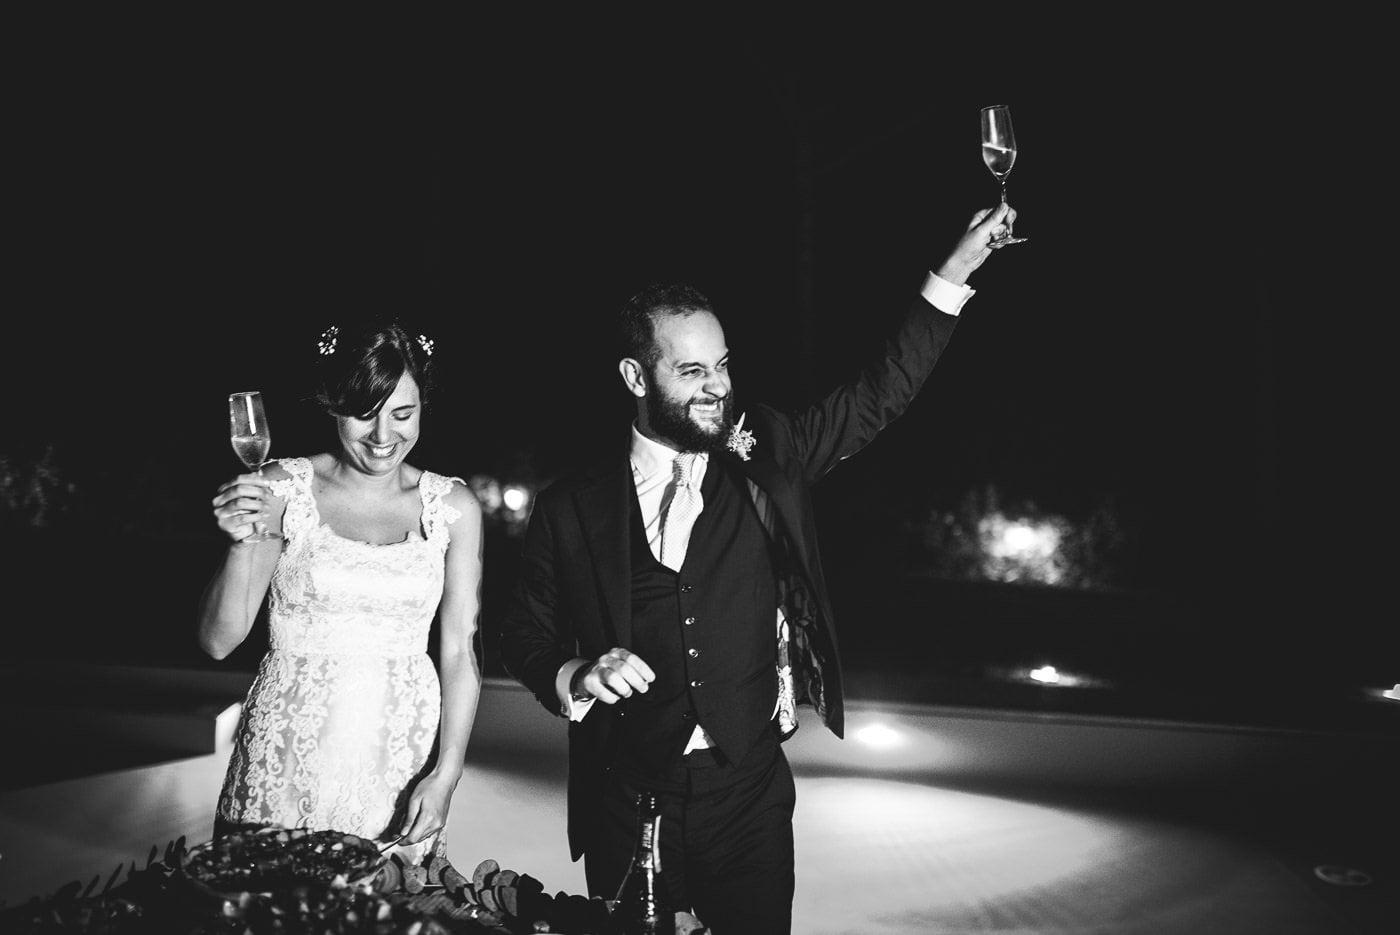 Matrimonio Giulia & Federico 09_15 – Alessio Nobili Photographer-56